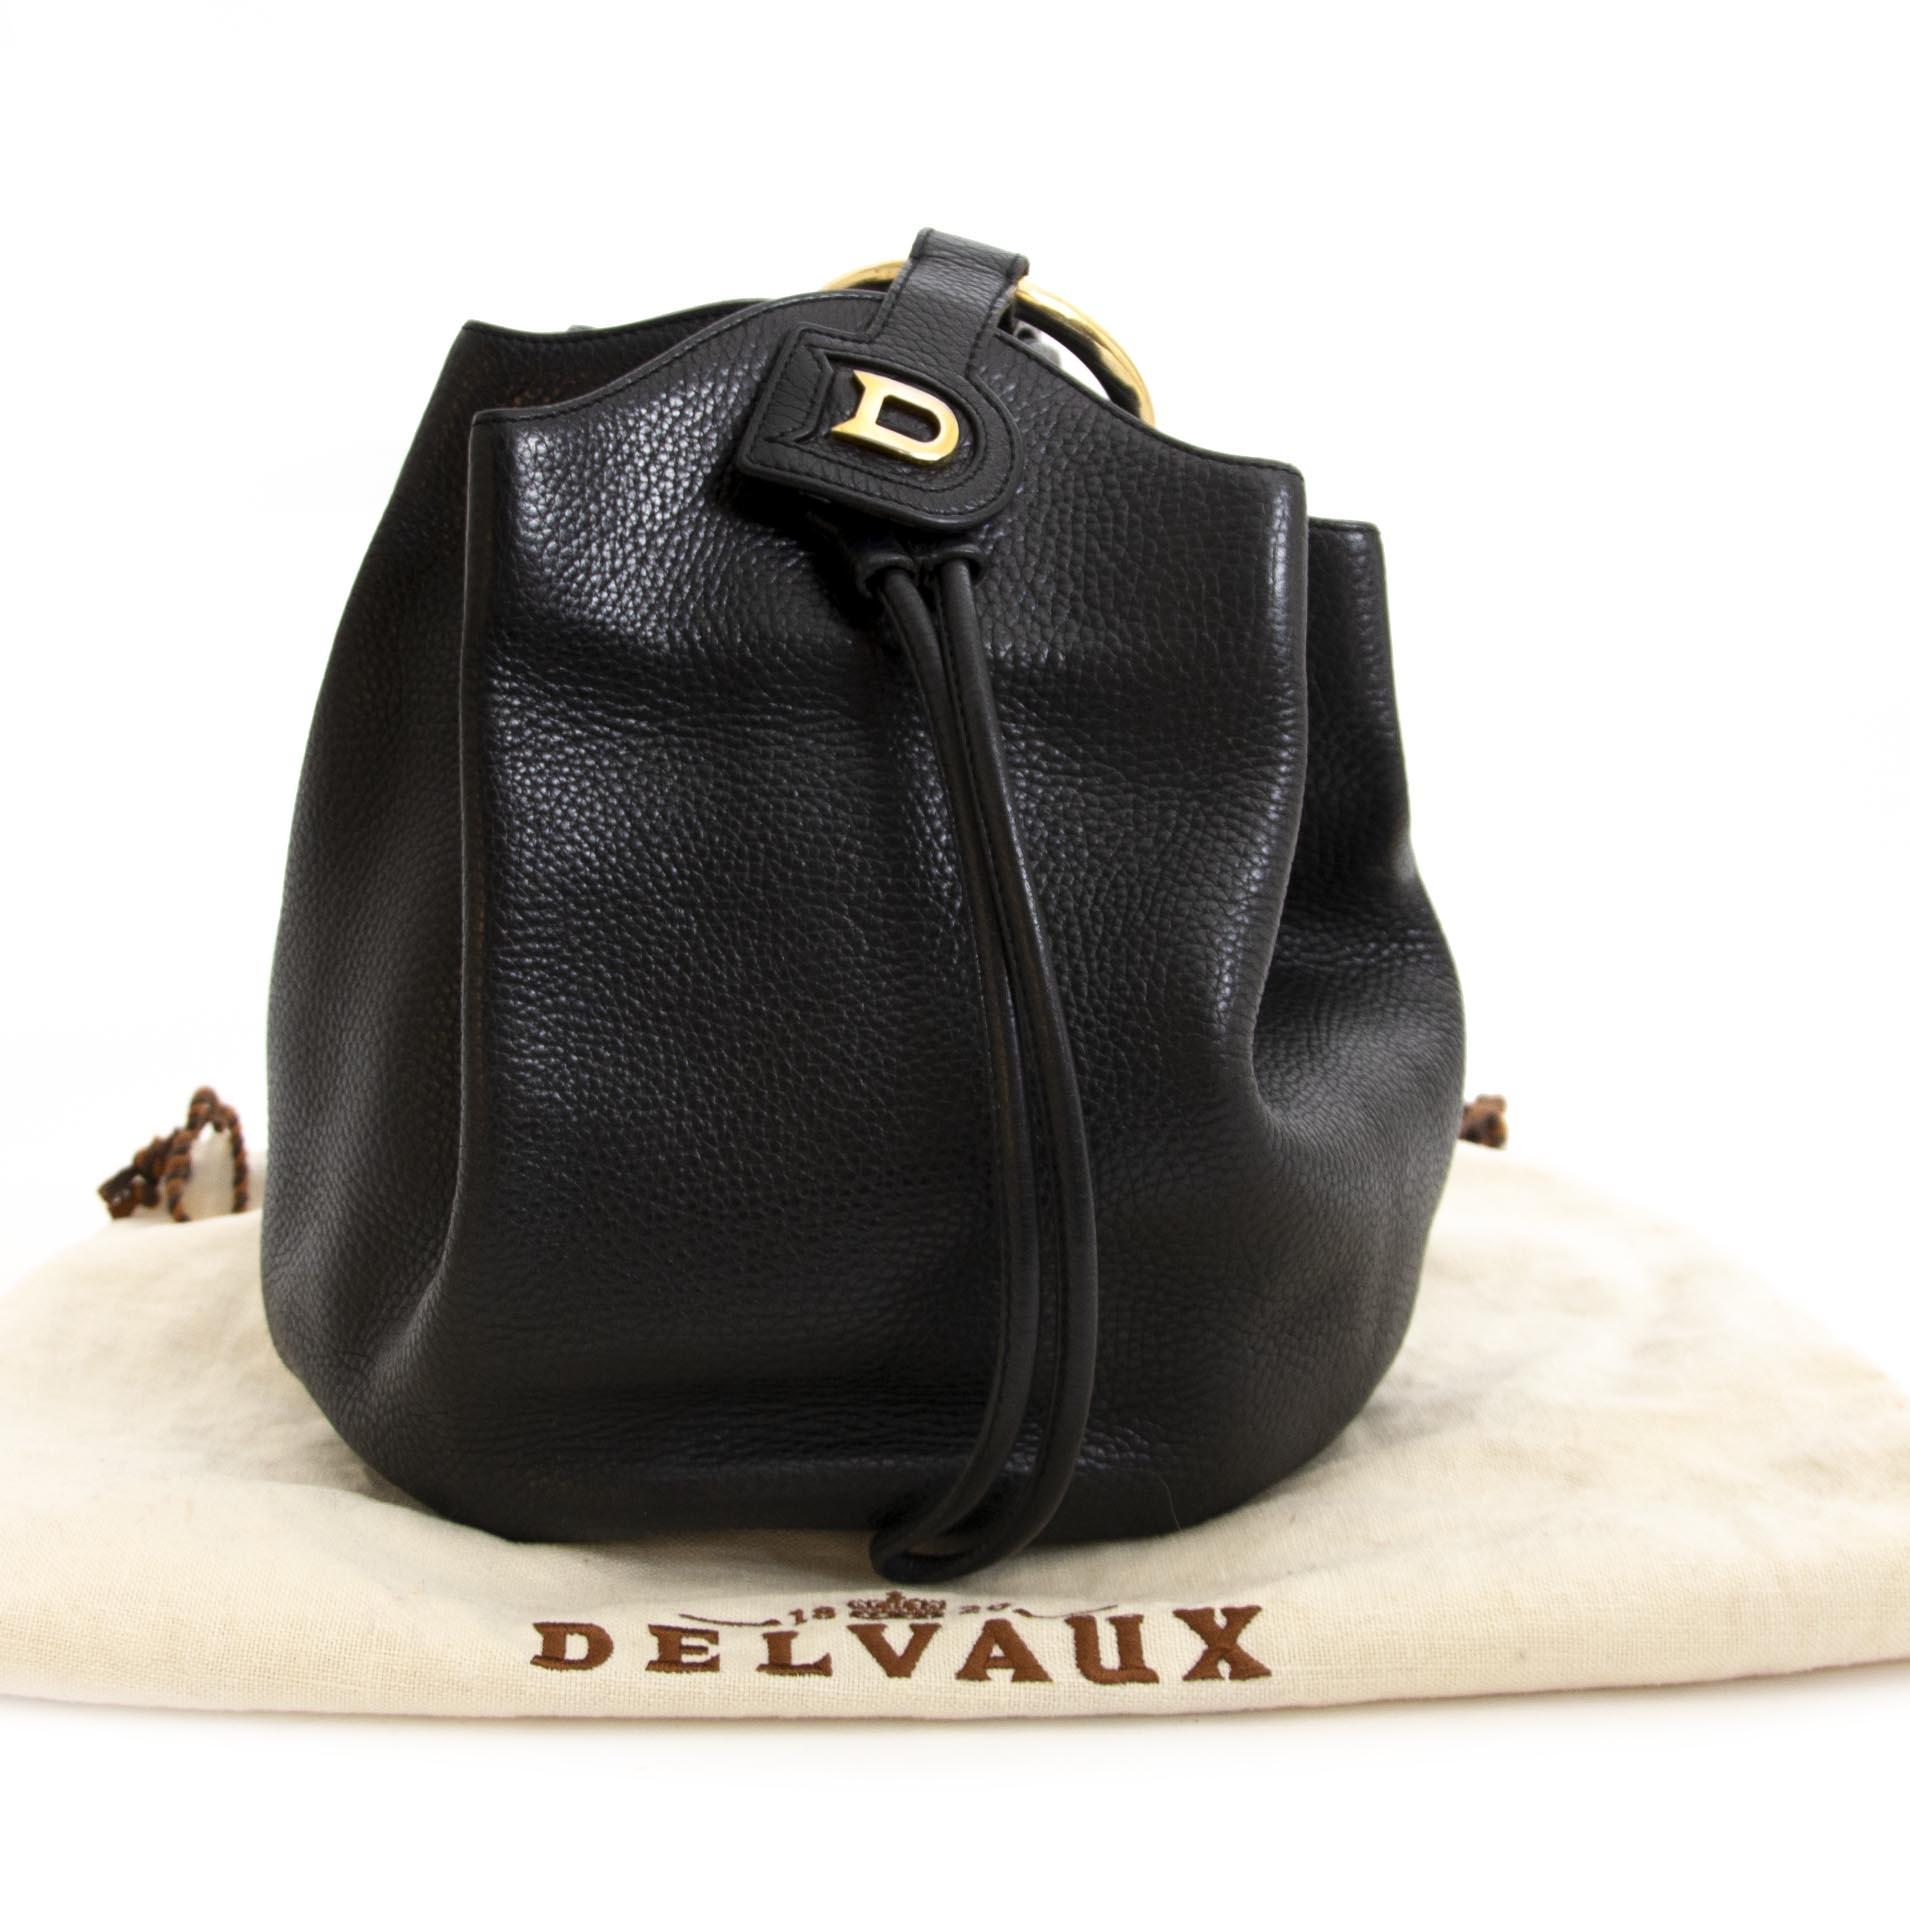 Delvaux Black Leather Rose Des Vents Bucket Bag